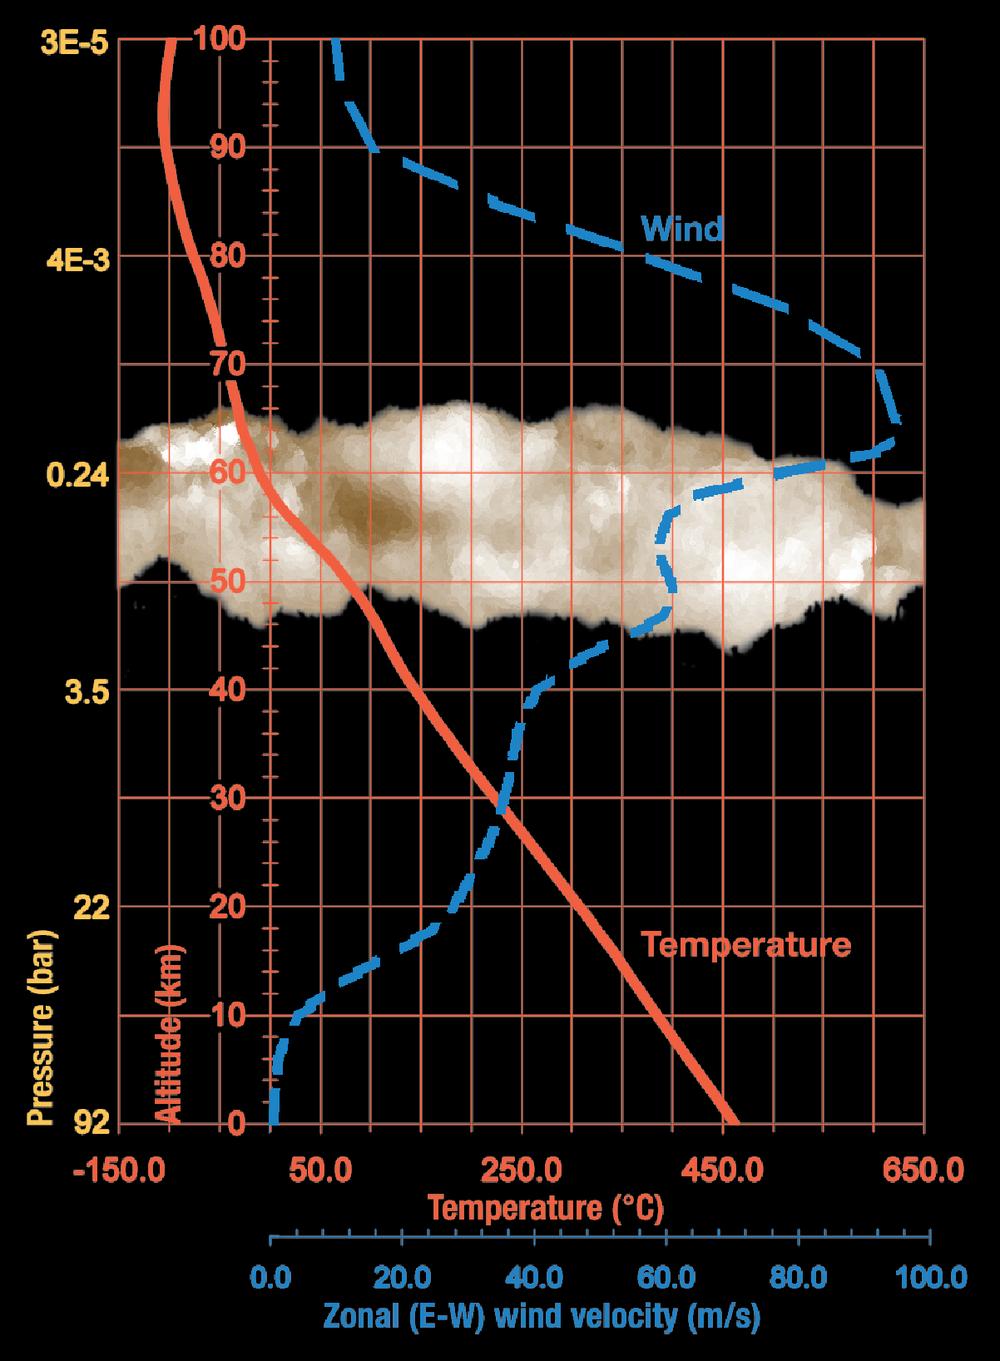 Venus extreme environments